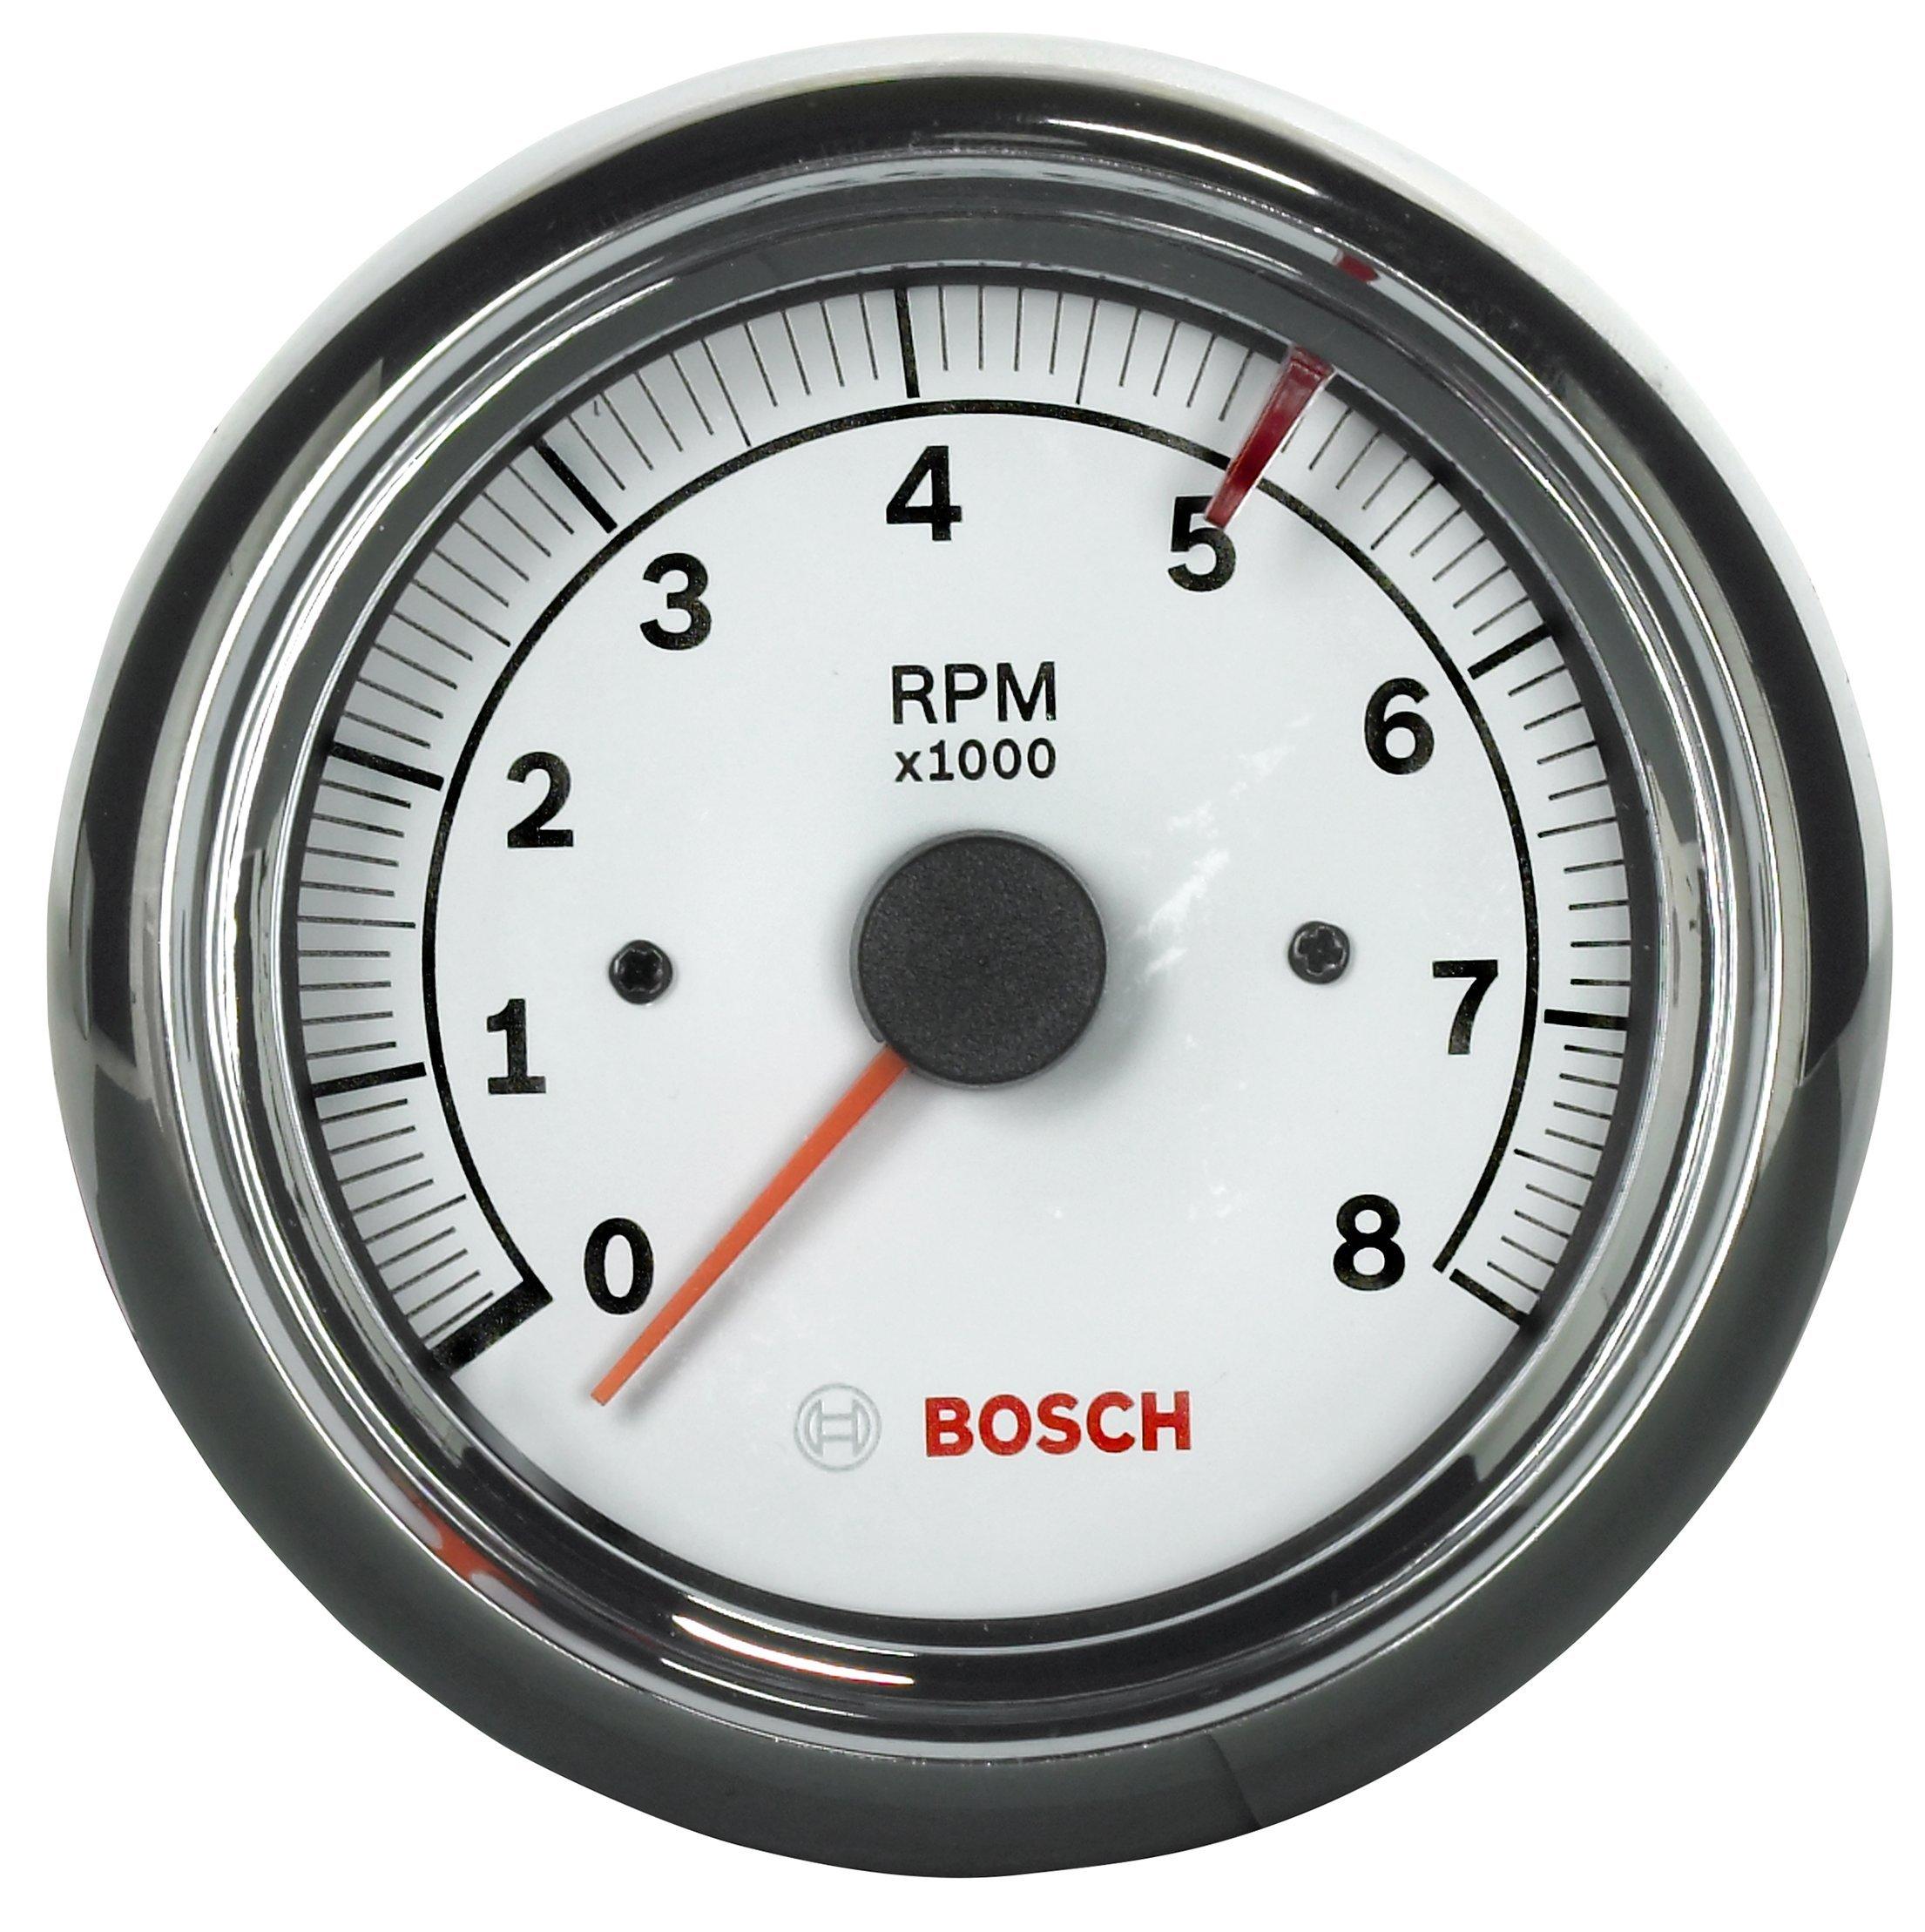 Bosch SP0F000020 Sport II 3-3/8'' Tachometer (White Dial Face, Chrome Bezel) by Bosch Automotive